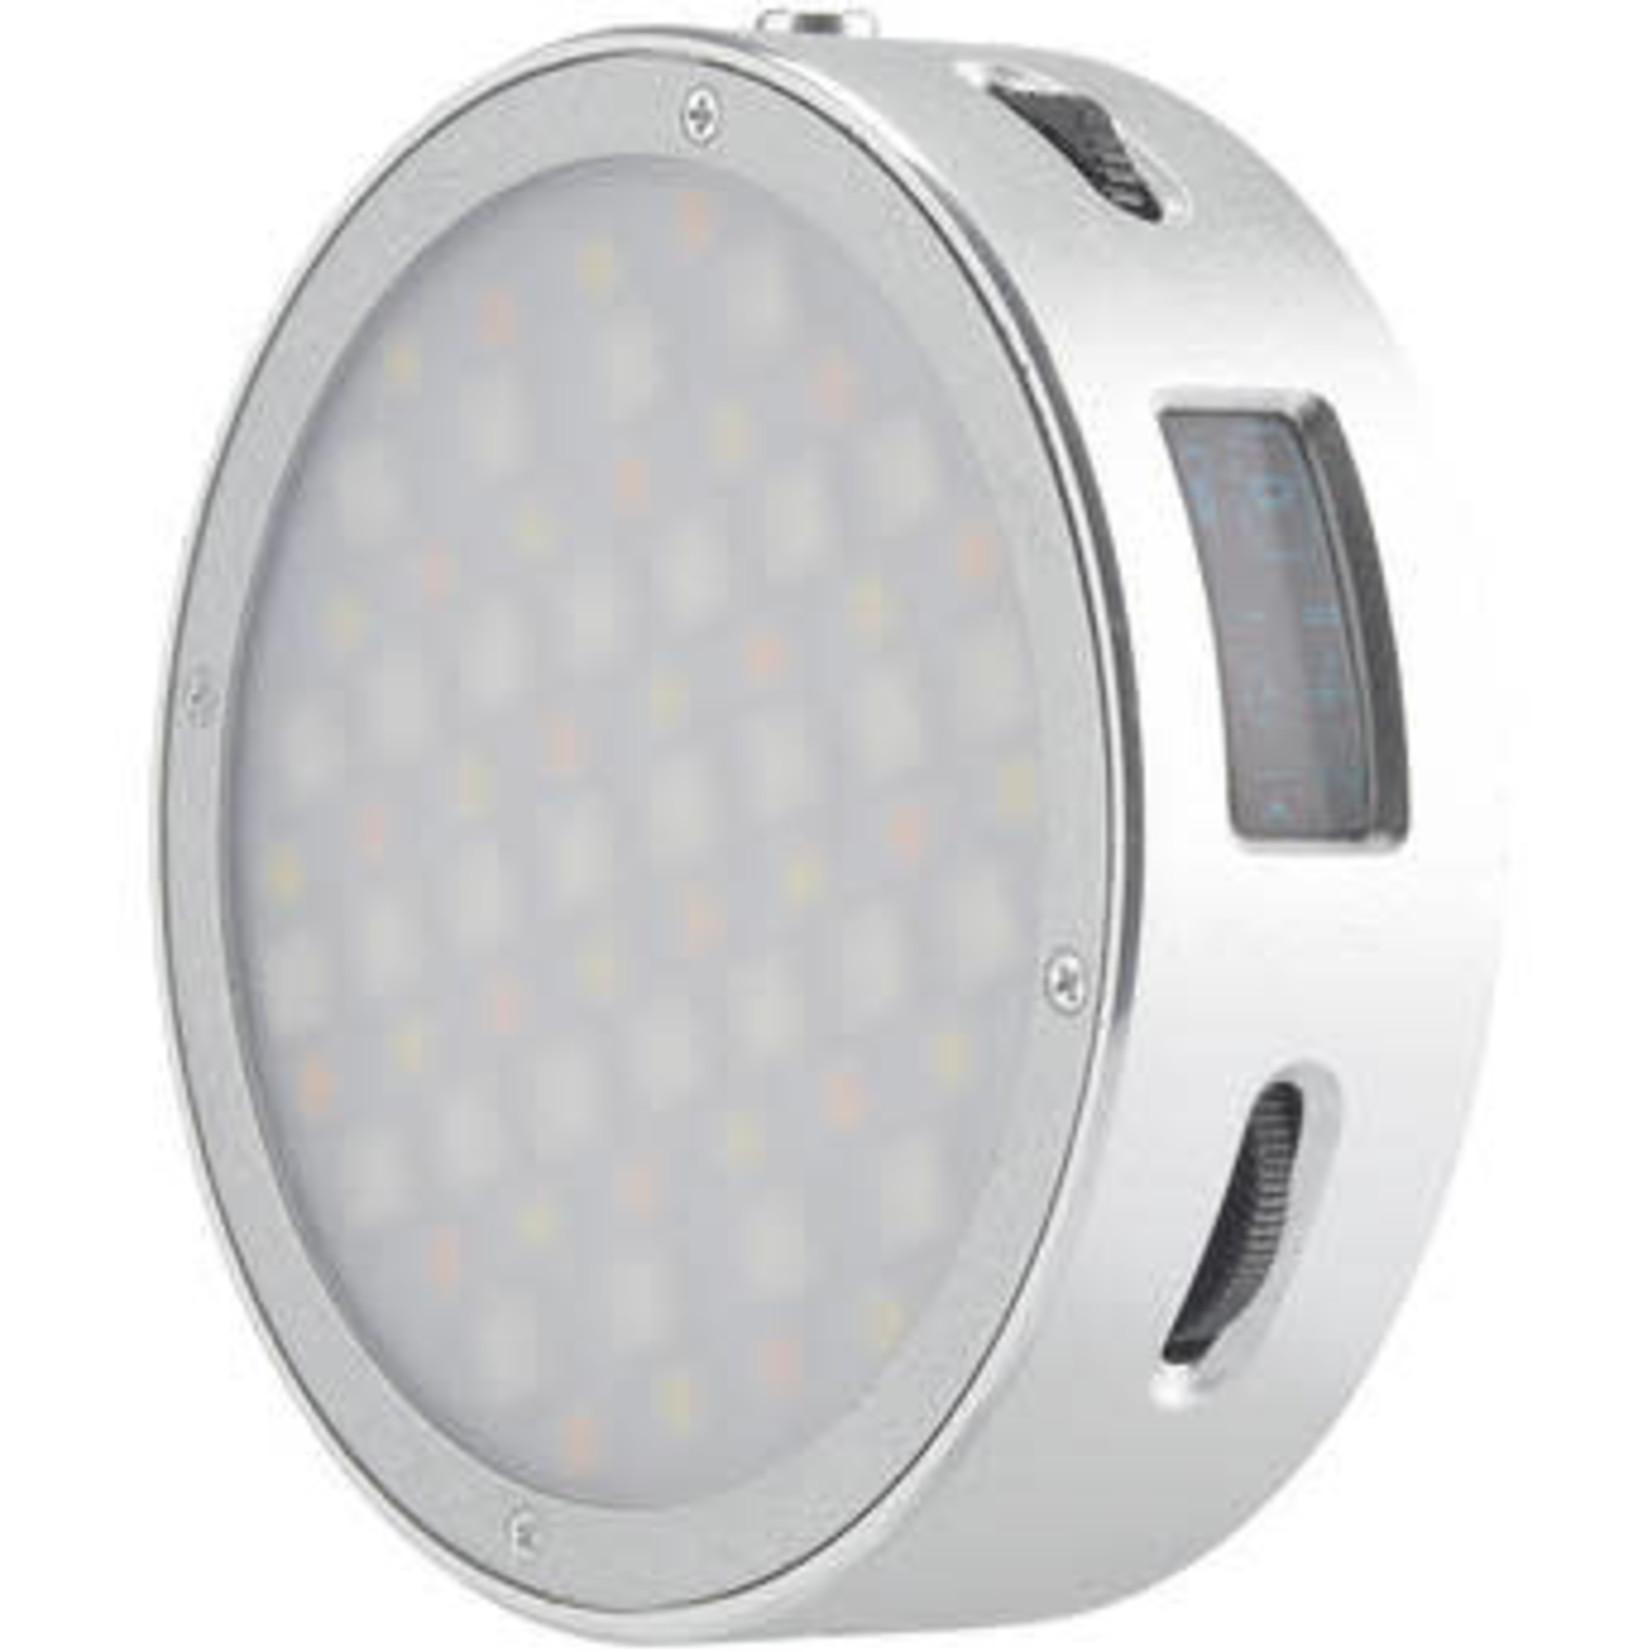 Godox Godox R1 Round RGB Mini Creative LED Light